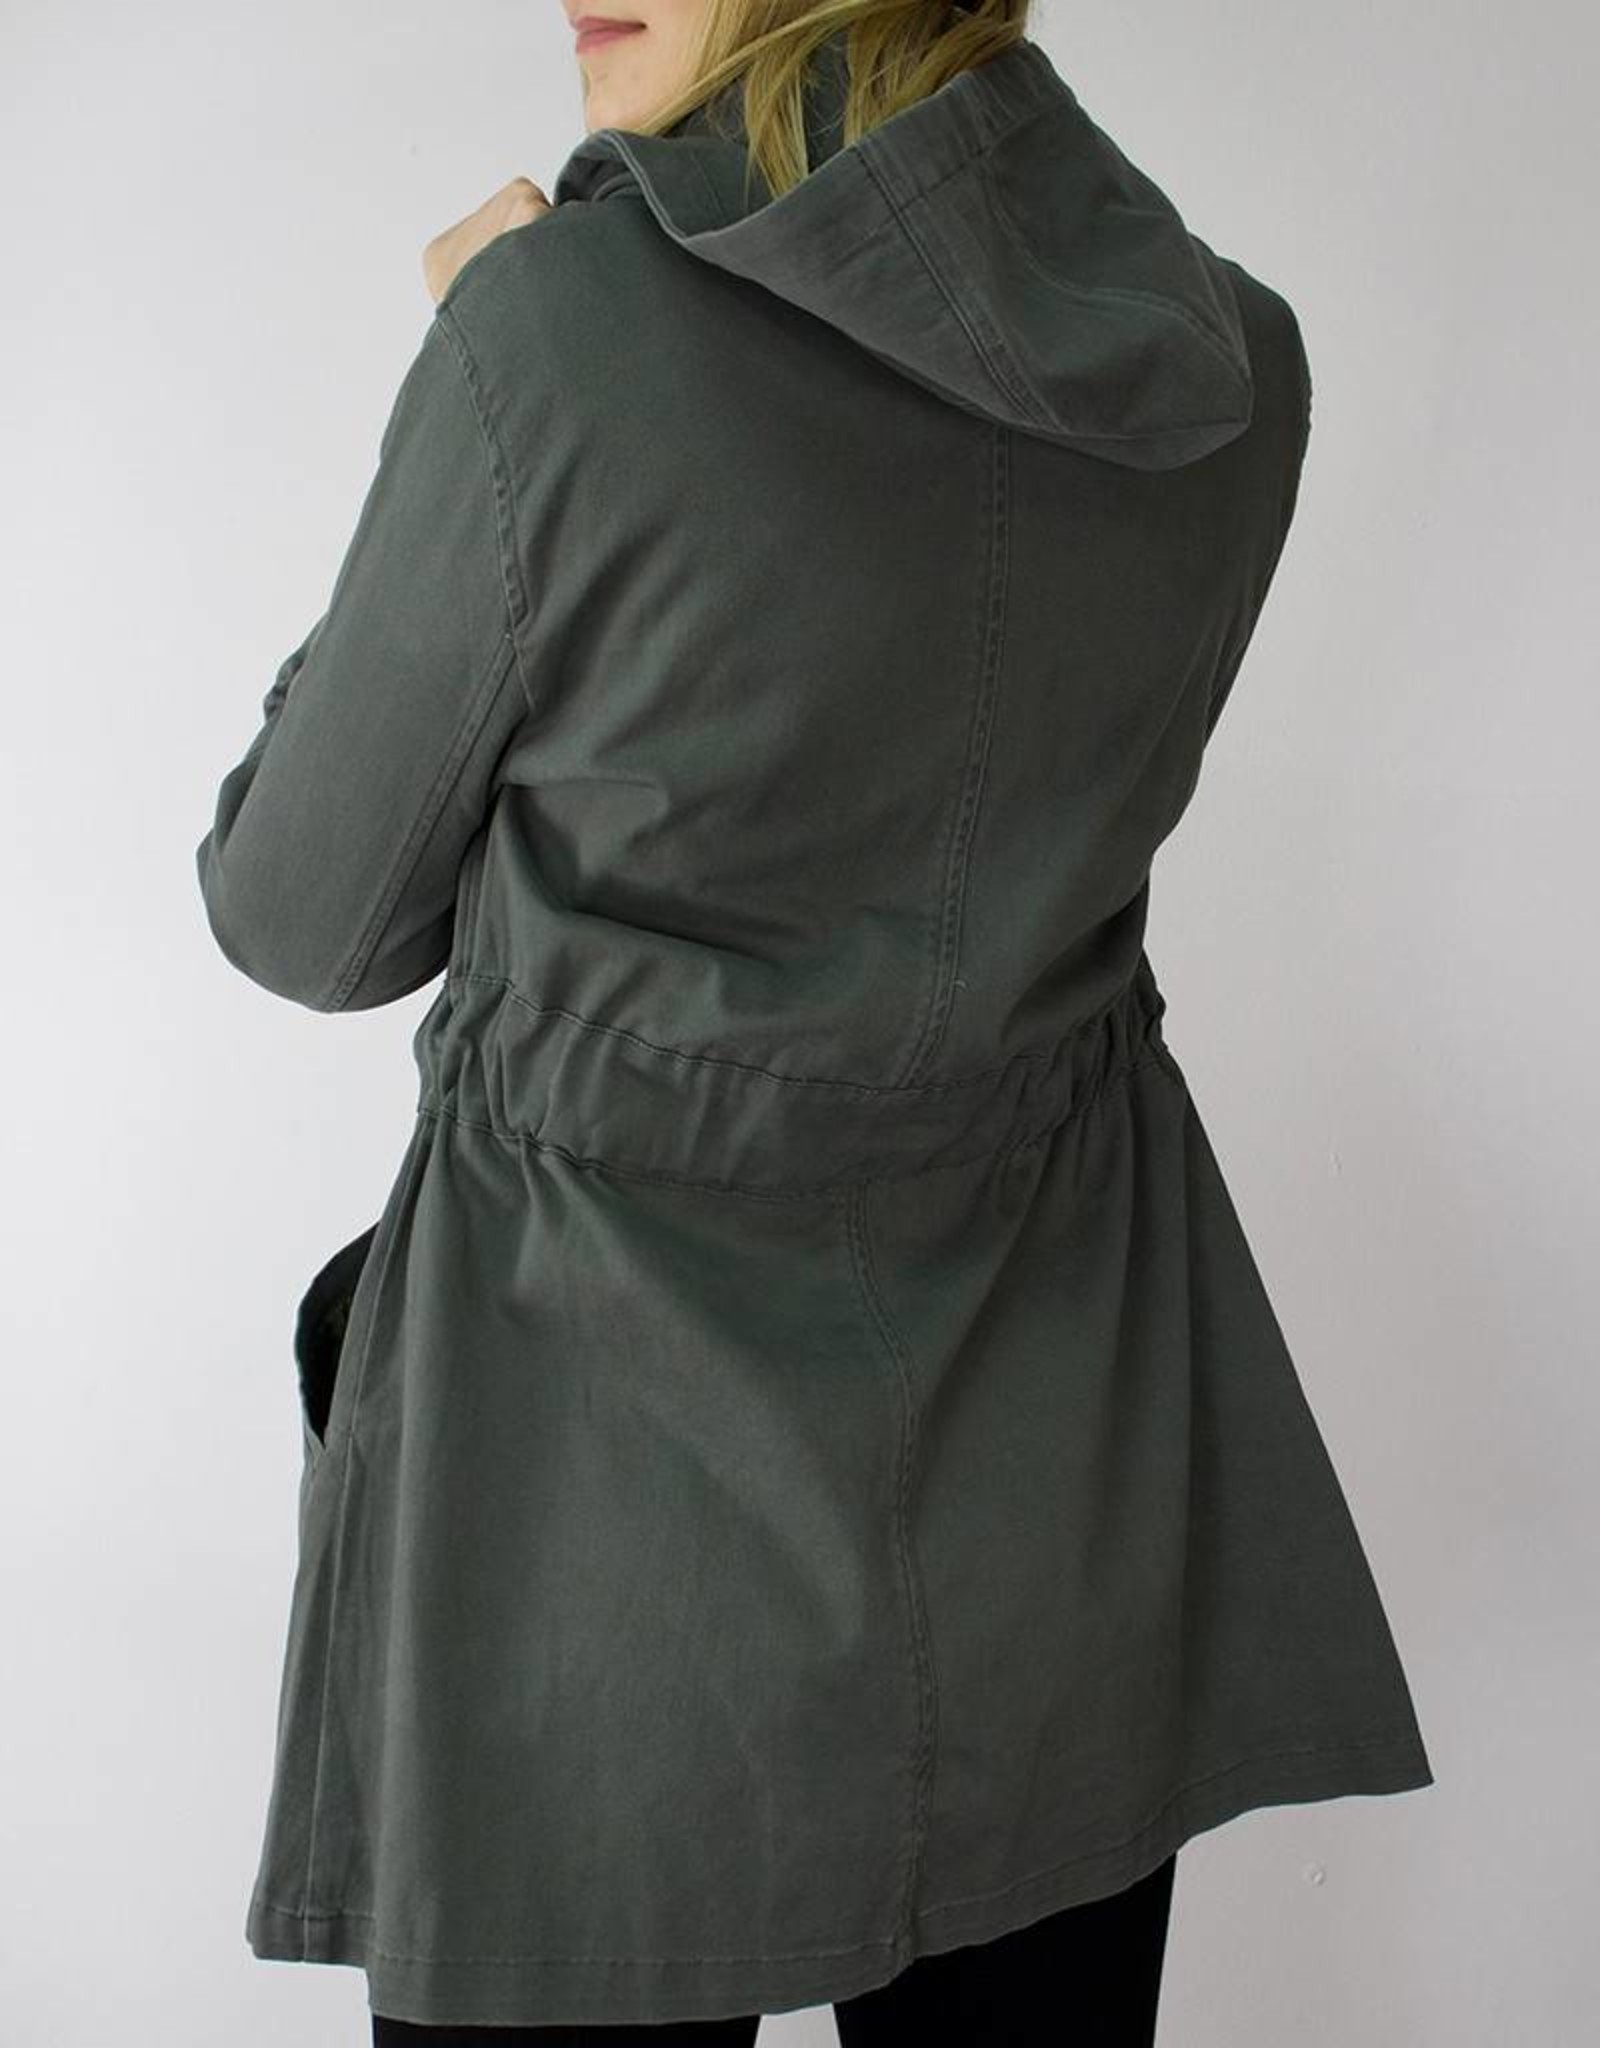 BB DAKOTA Surg Hood Jacket